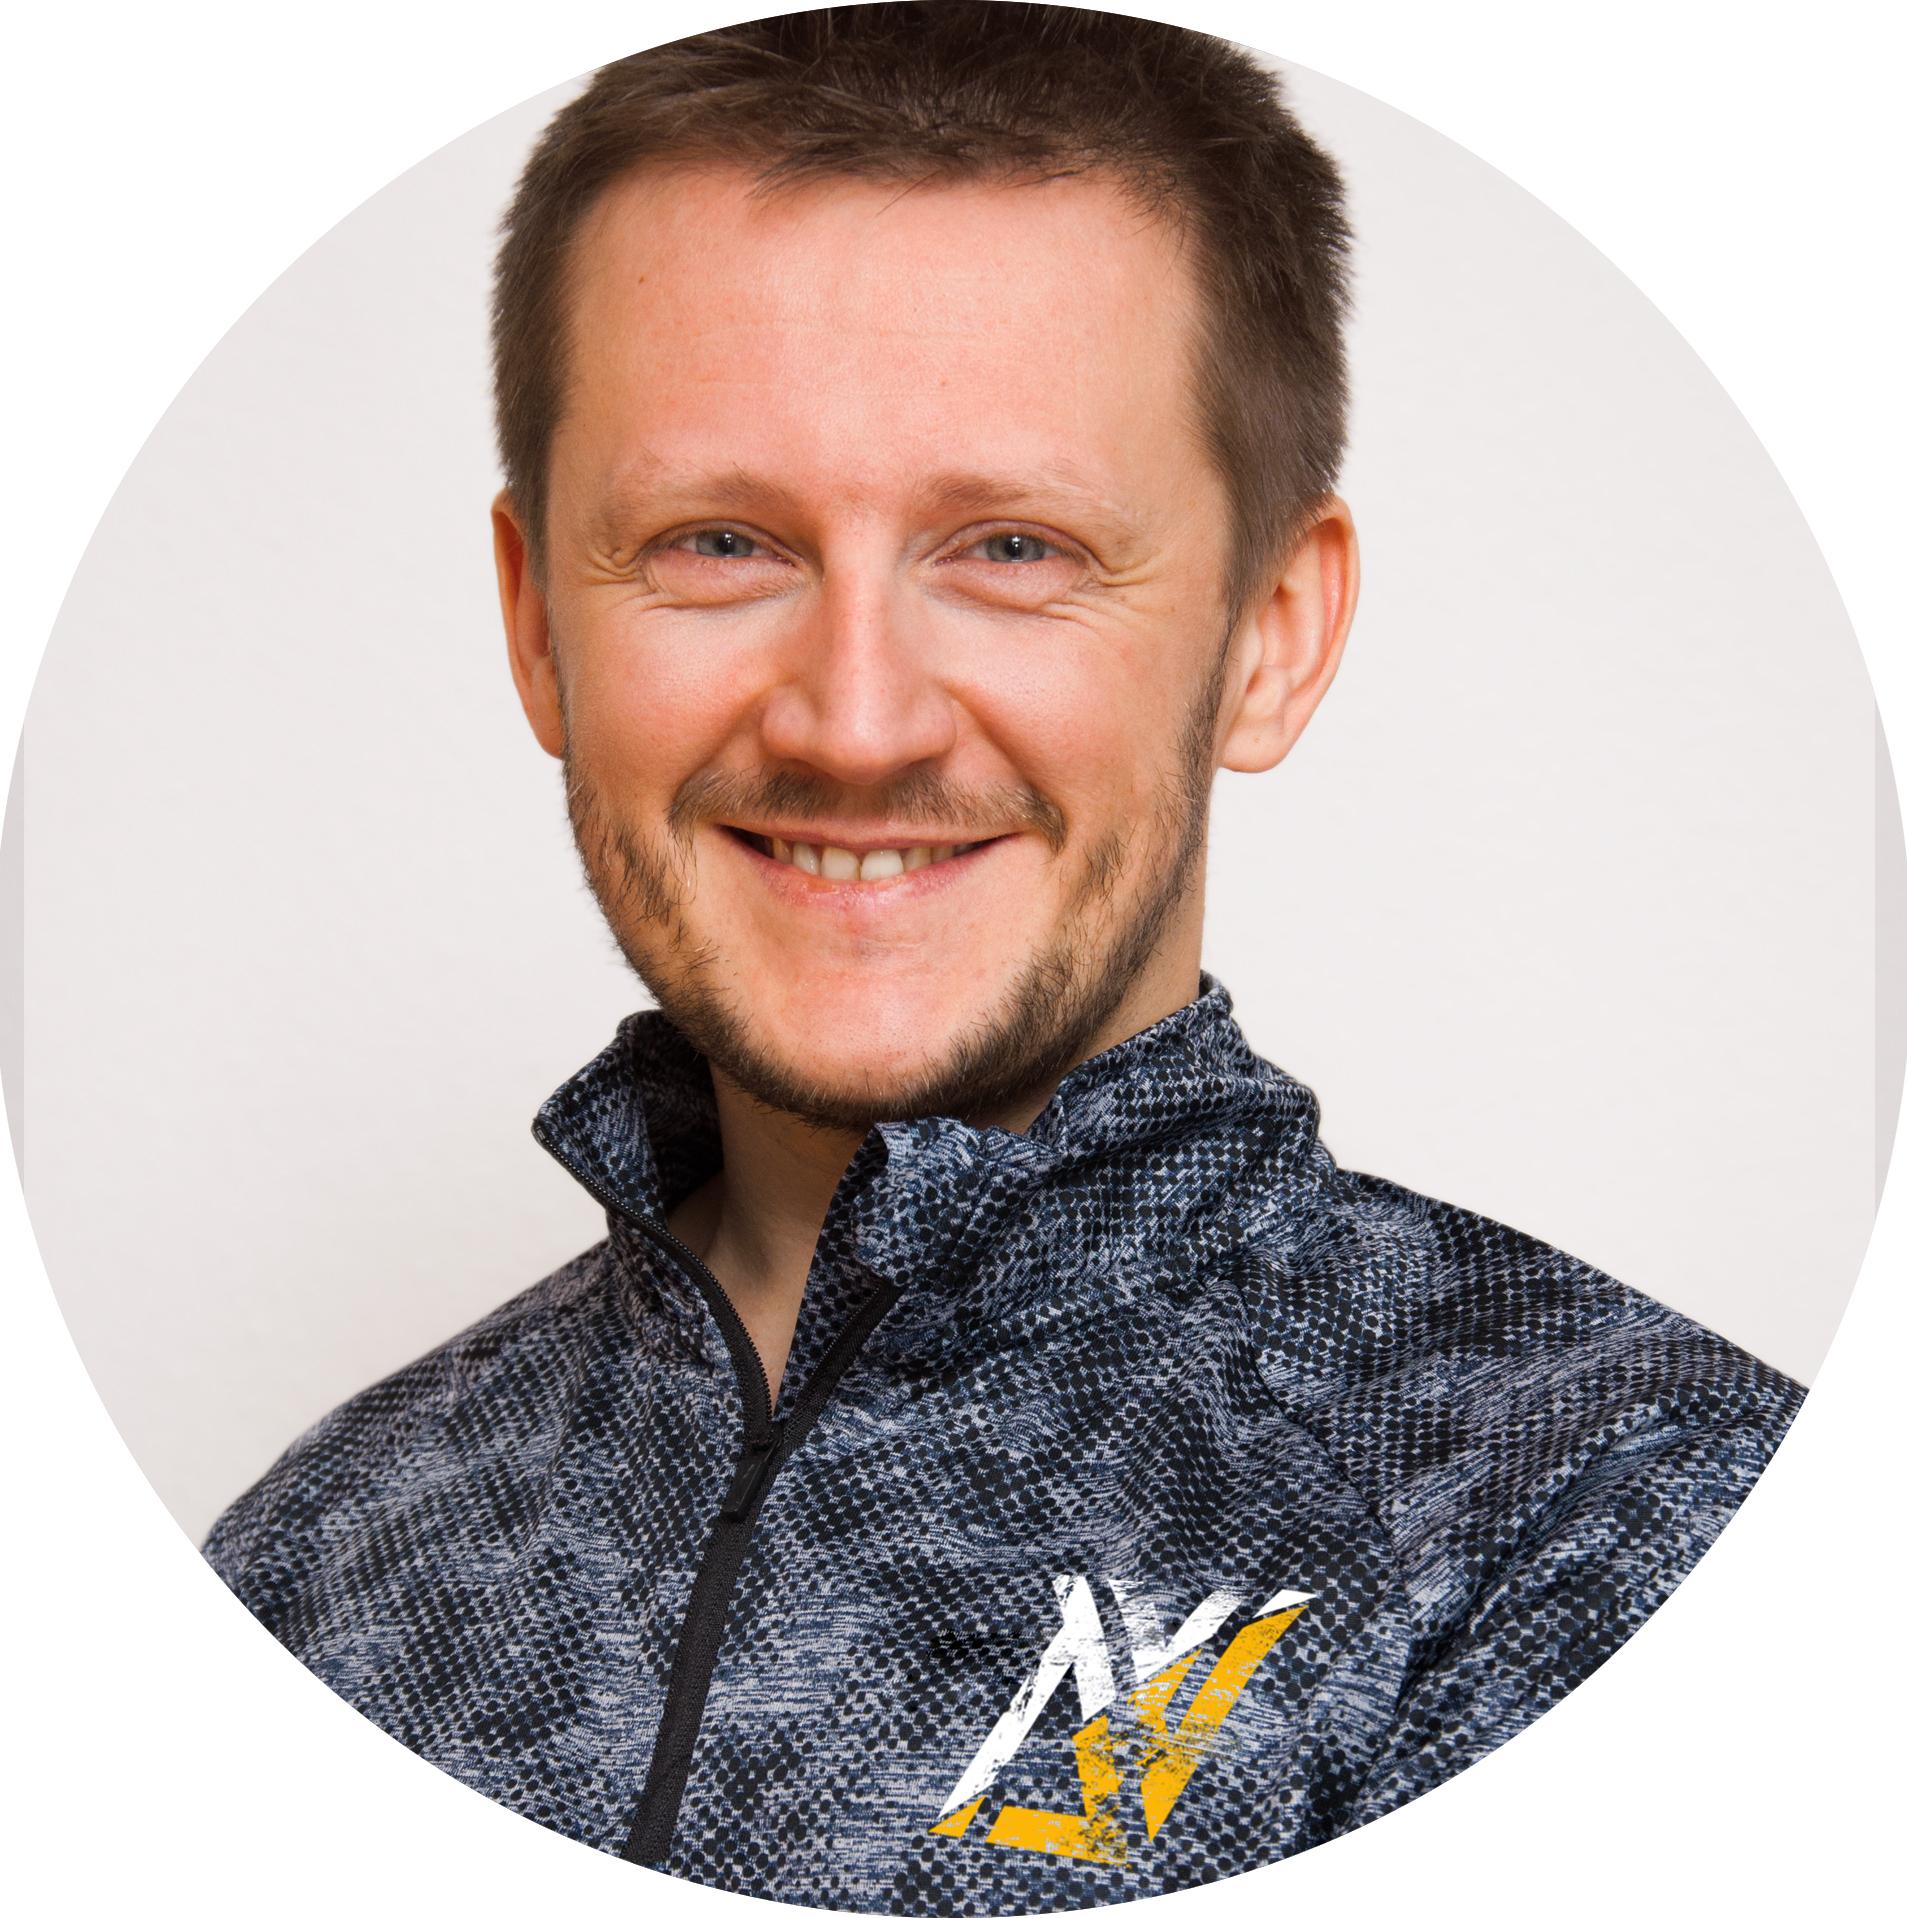 Profilbild Alexander Wulf